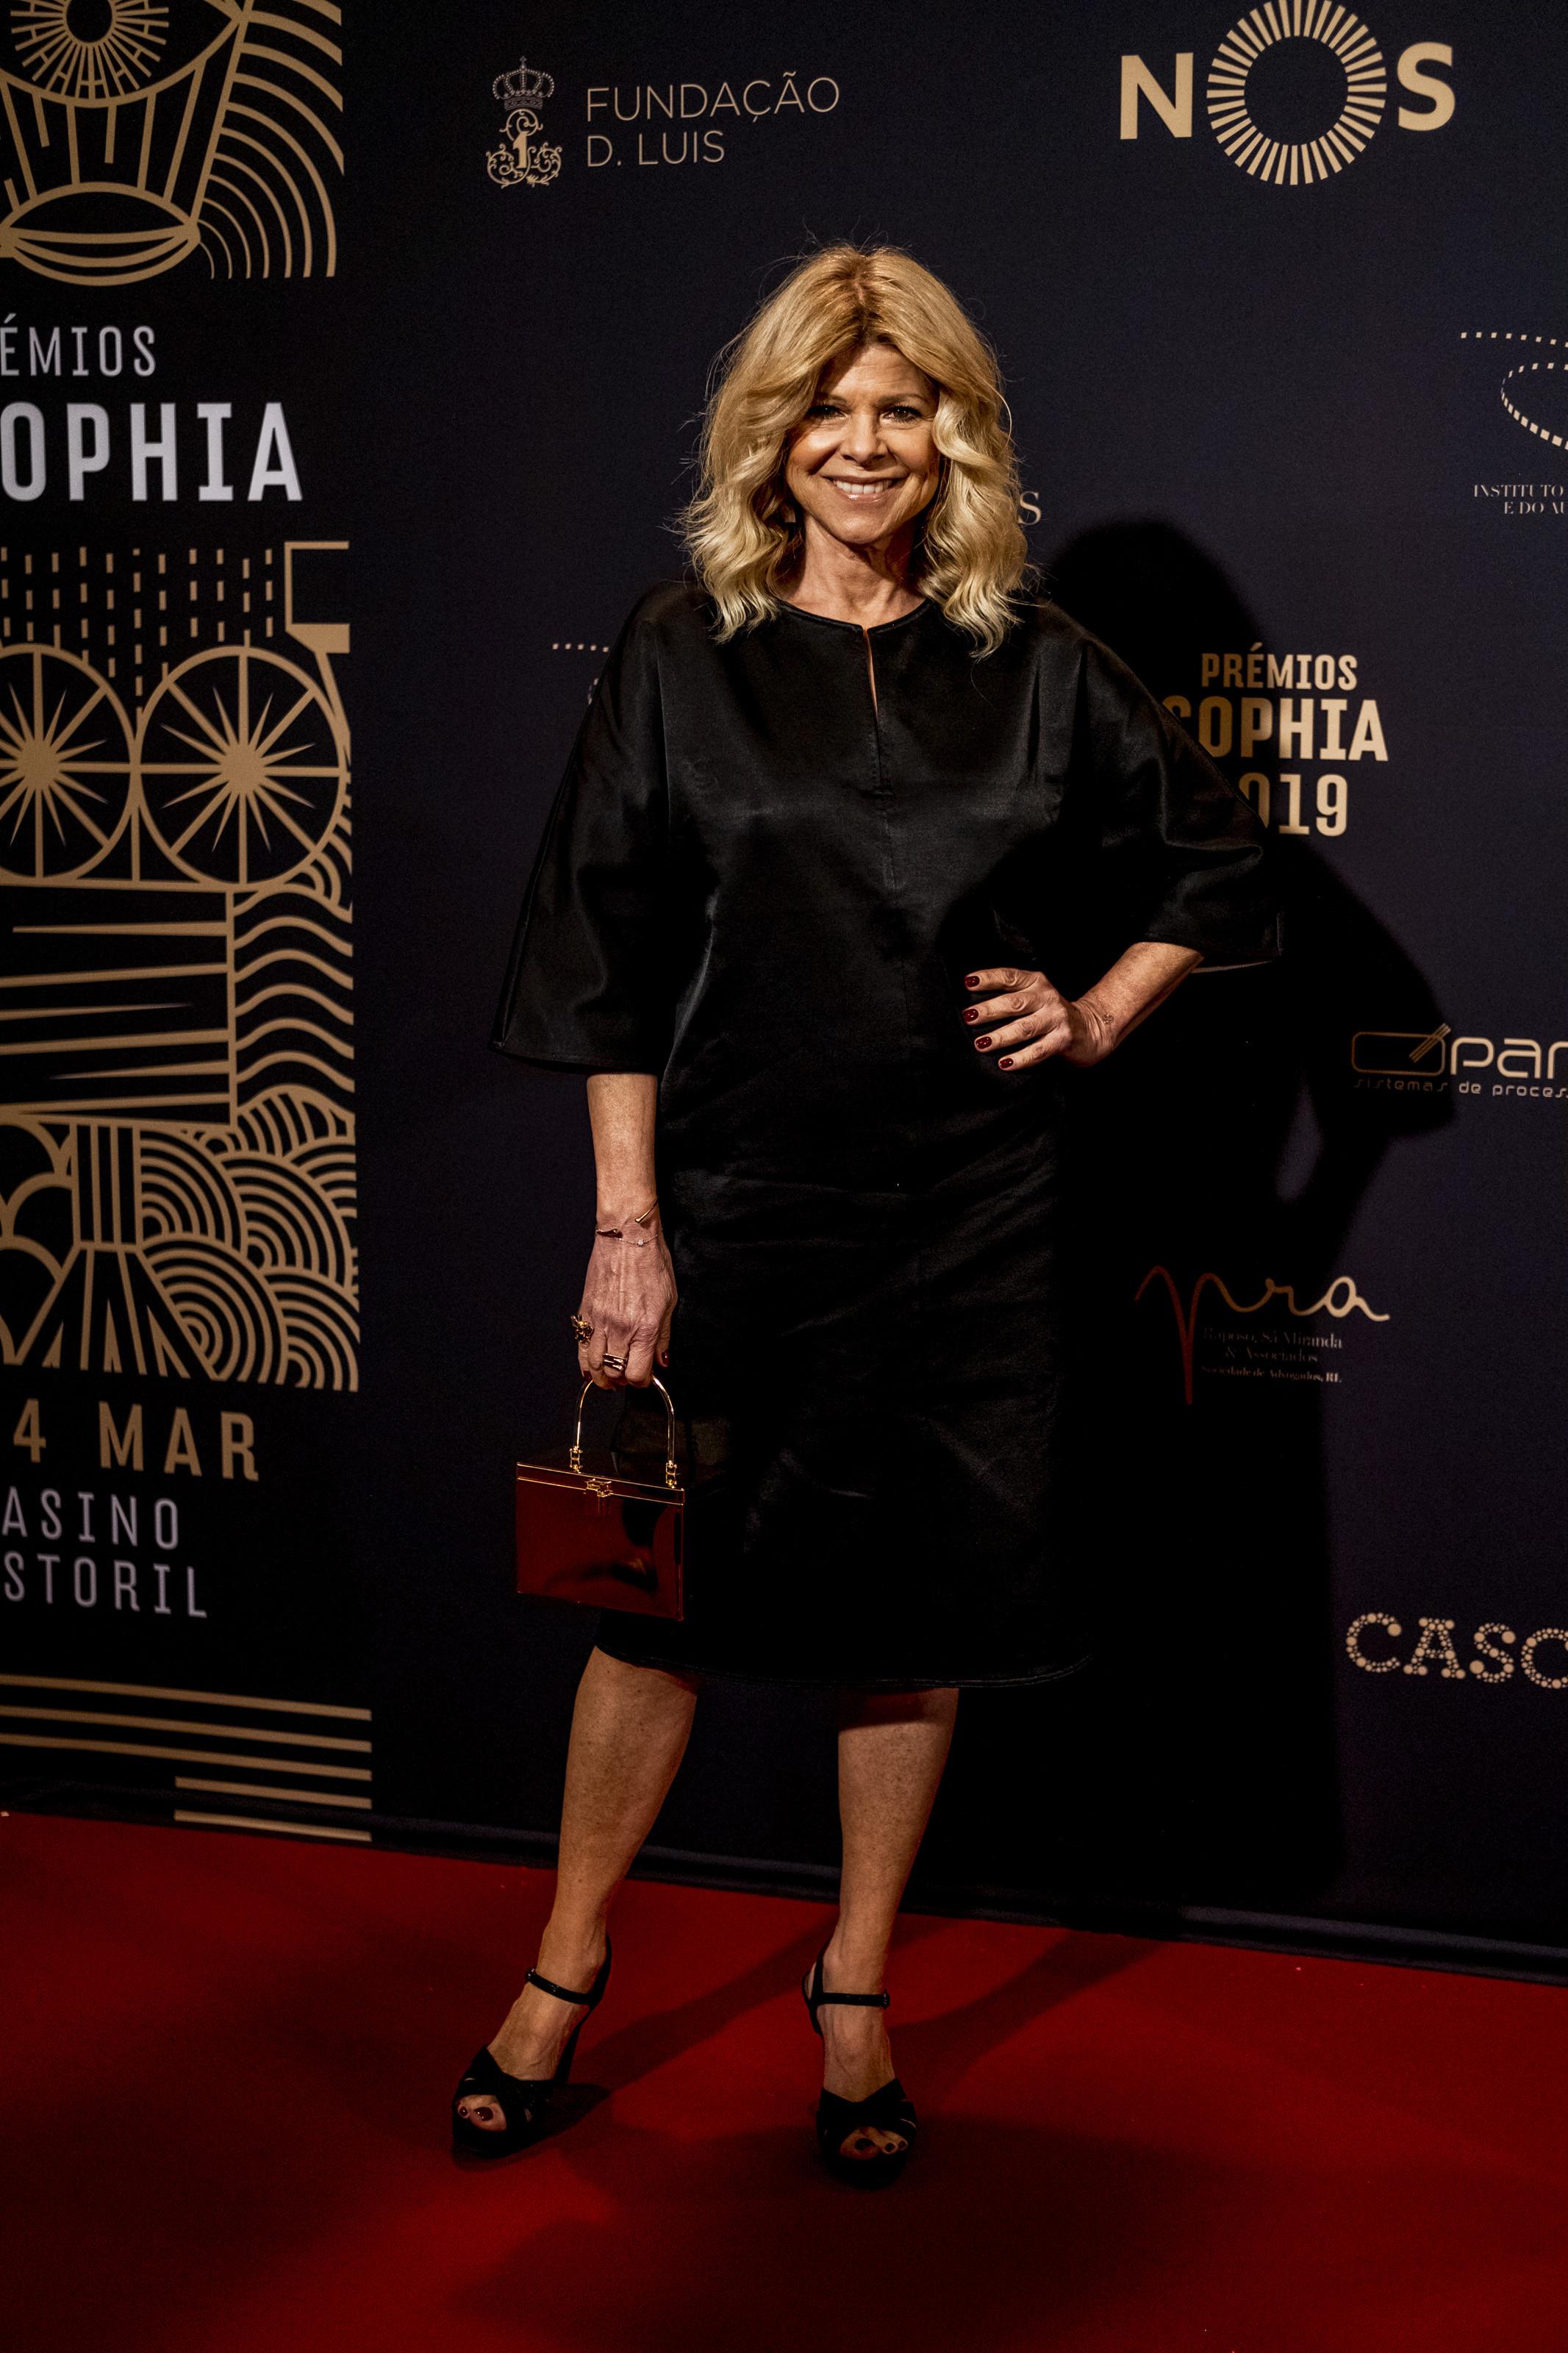 Os looks escolhidos para a gala dos prémios Sophia